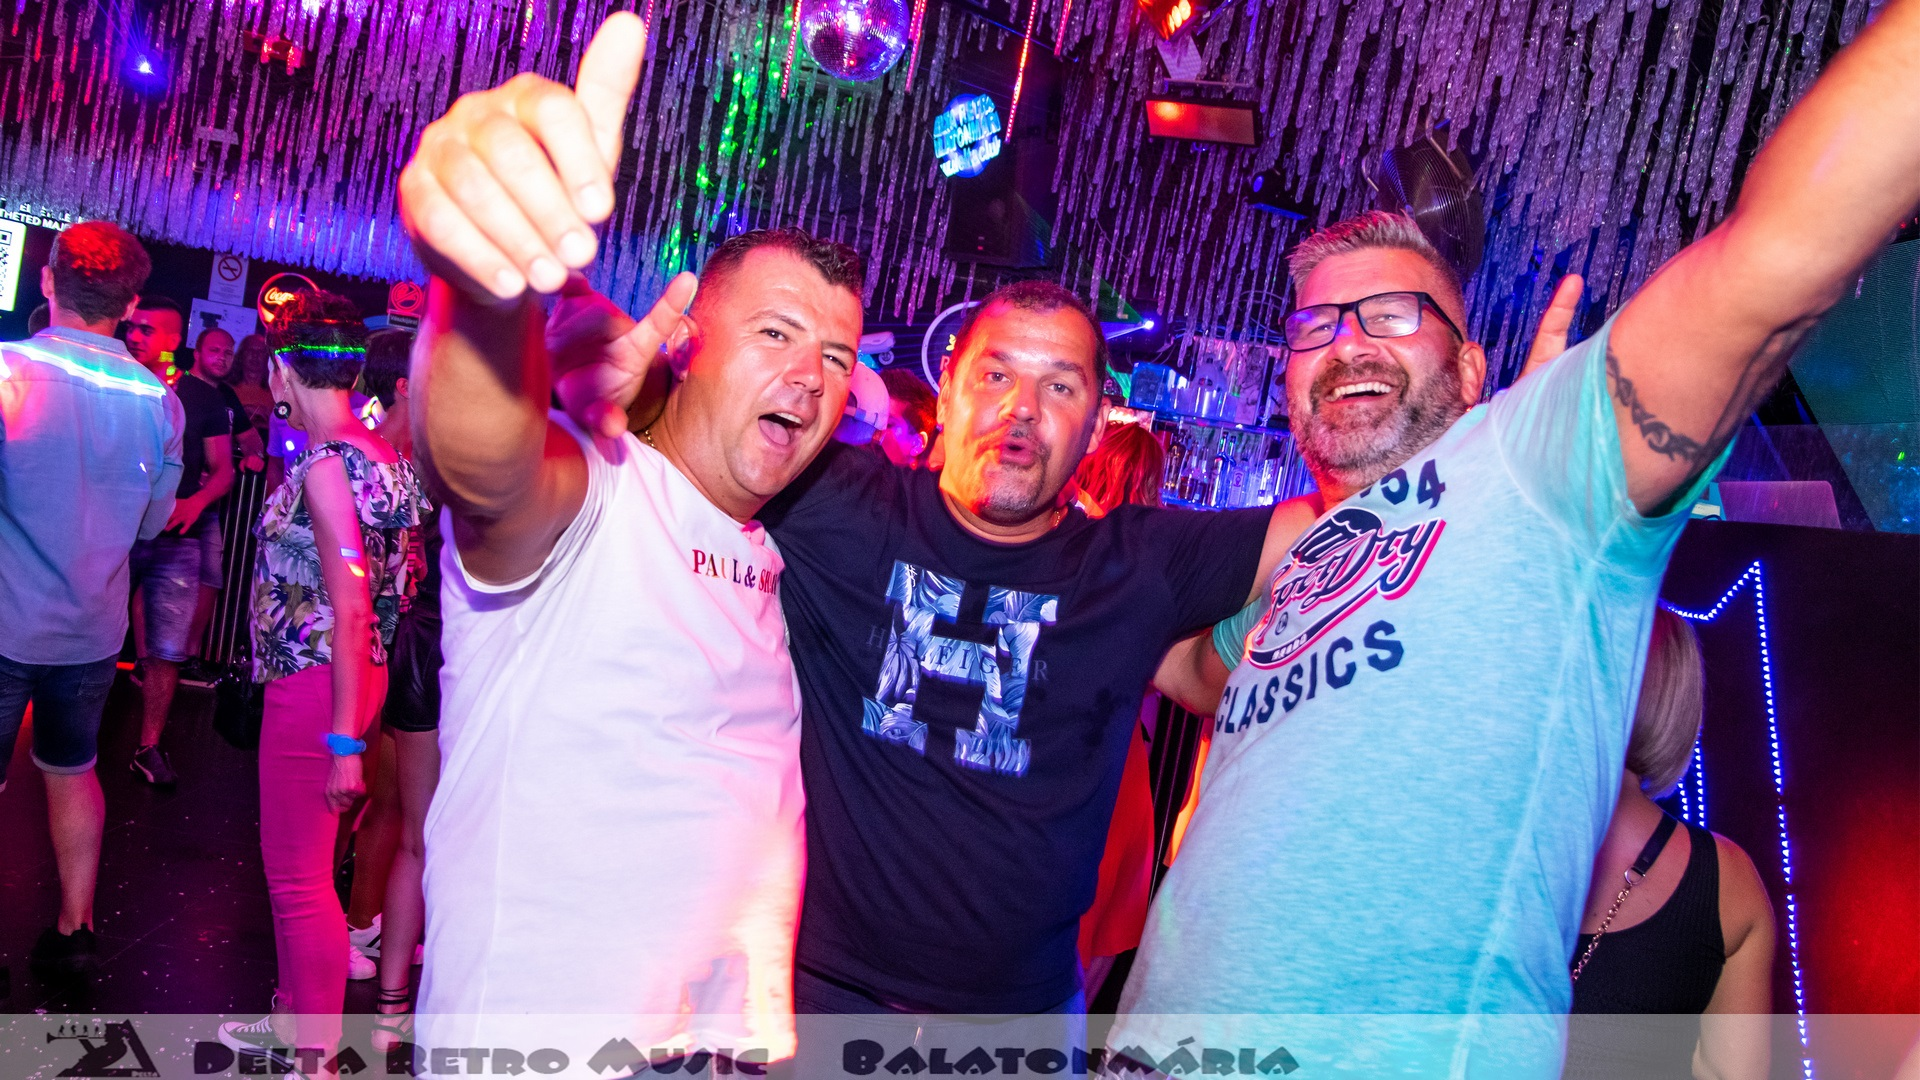 luxfunk-radio-funky-party_200807_delta retro-music-factory_065